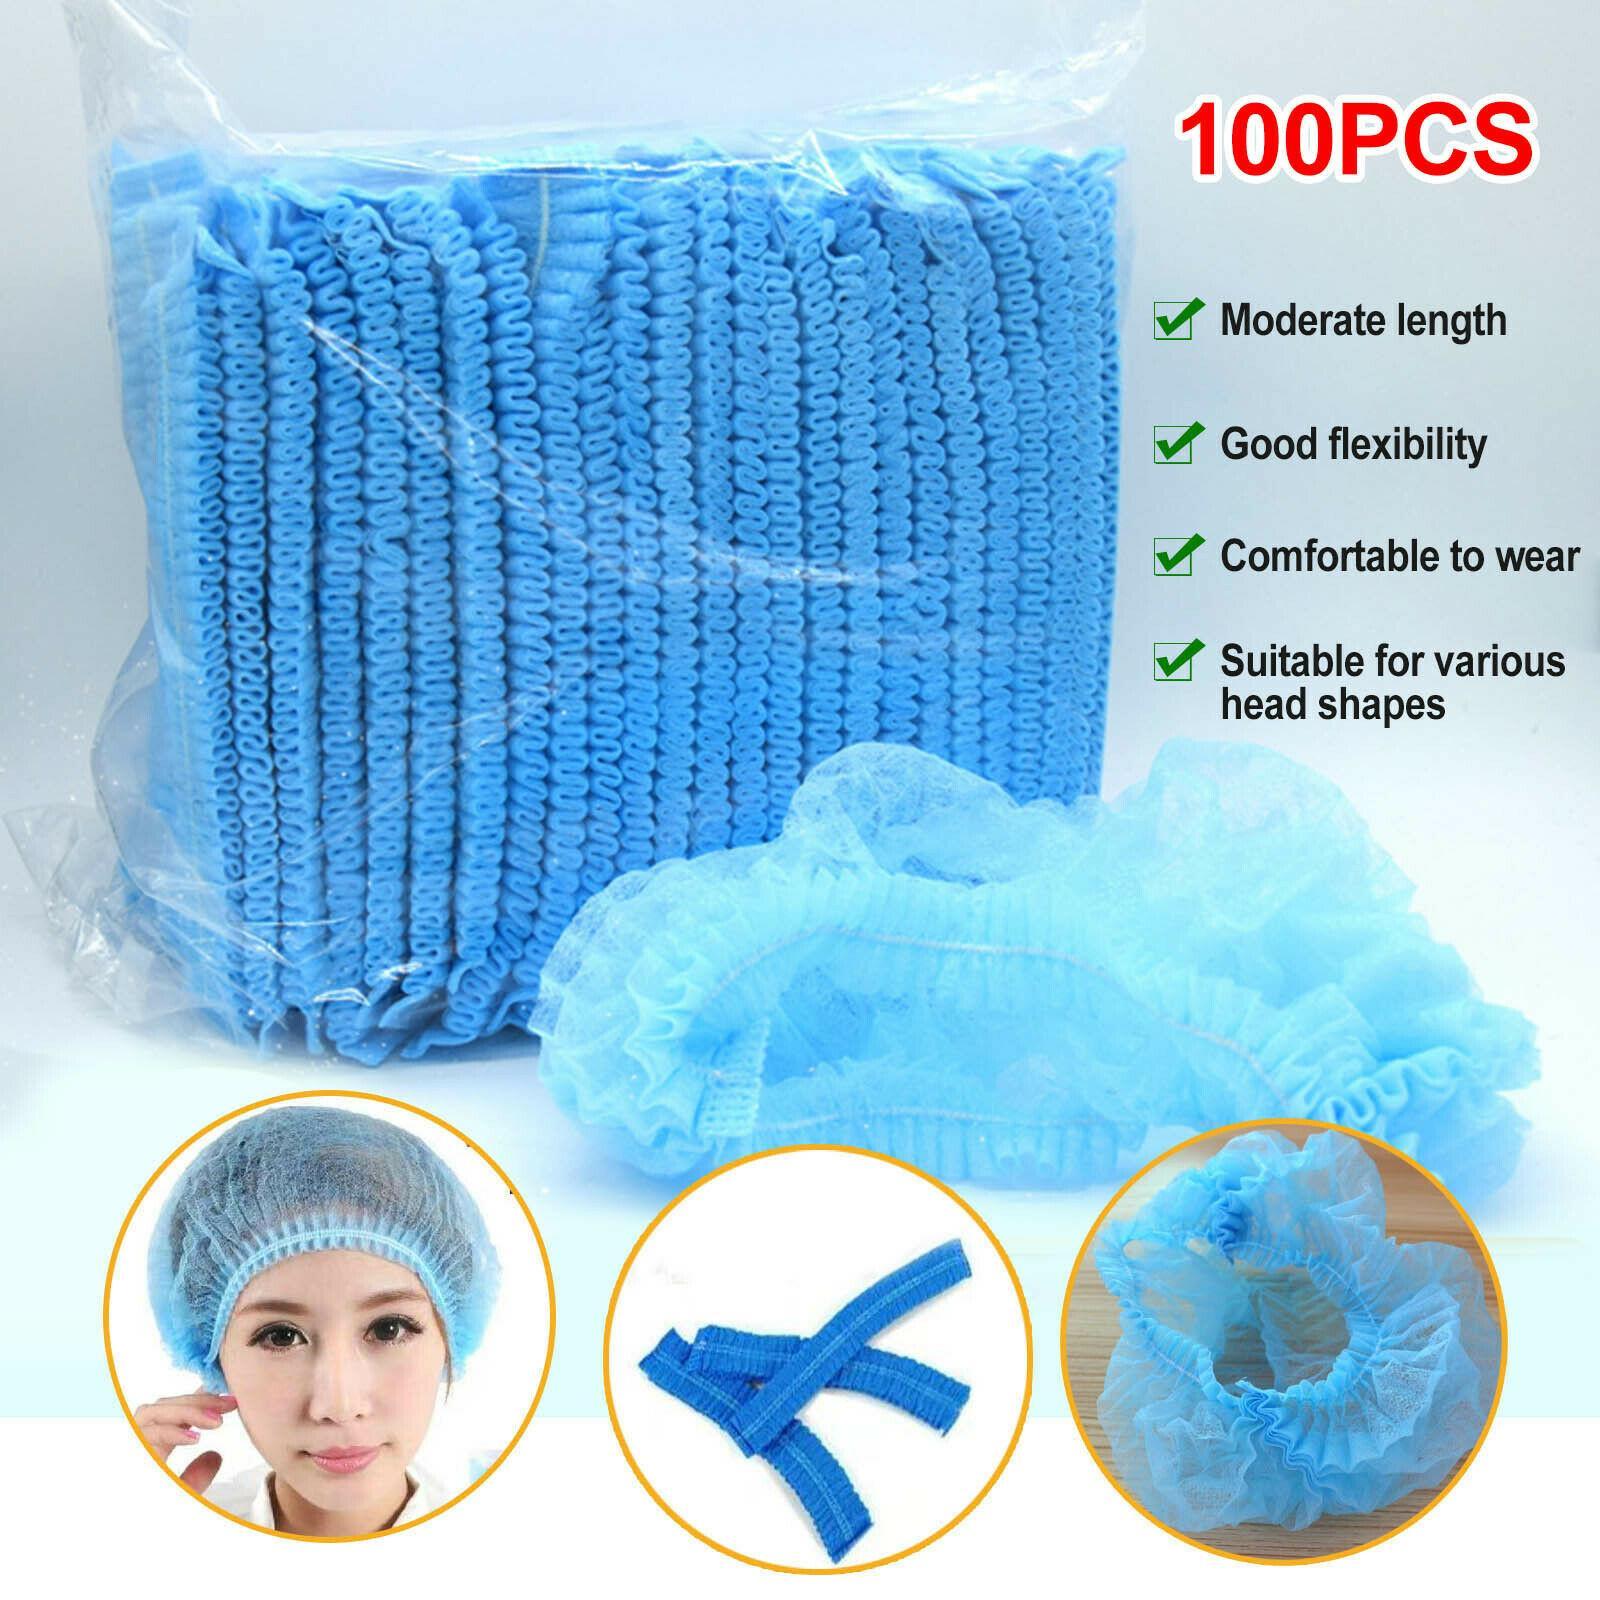 Free Shipping! 100pcs Disposable Hair Net Bouffant Cap Non Woven Stretch Dust Cap Head Cover